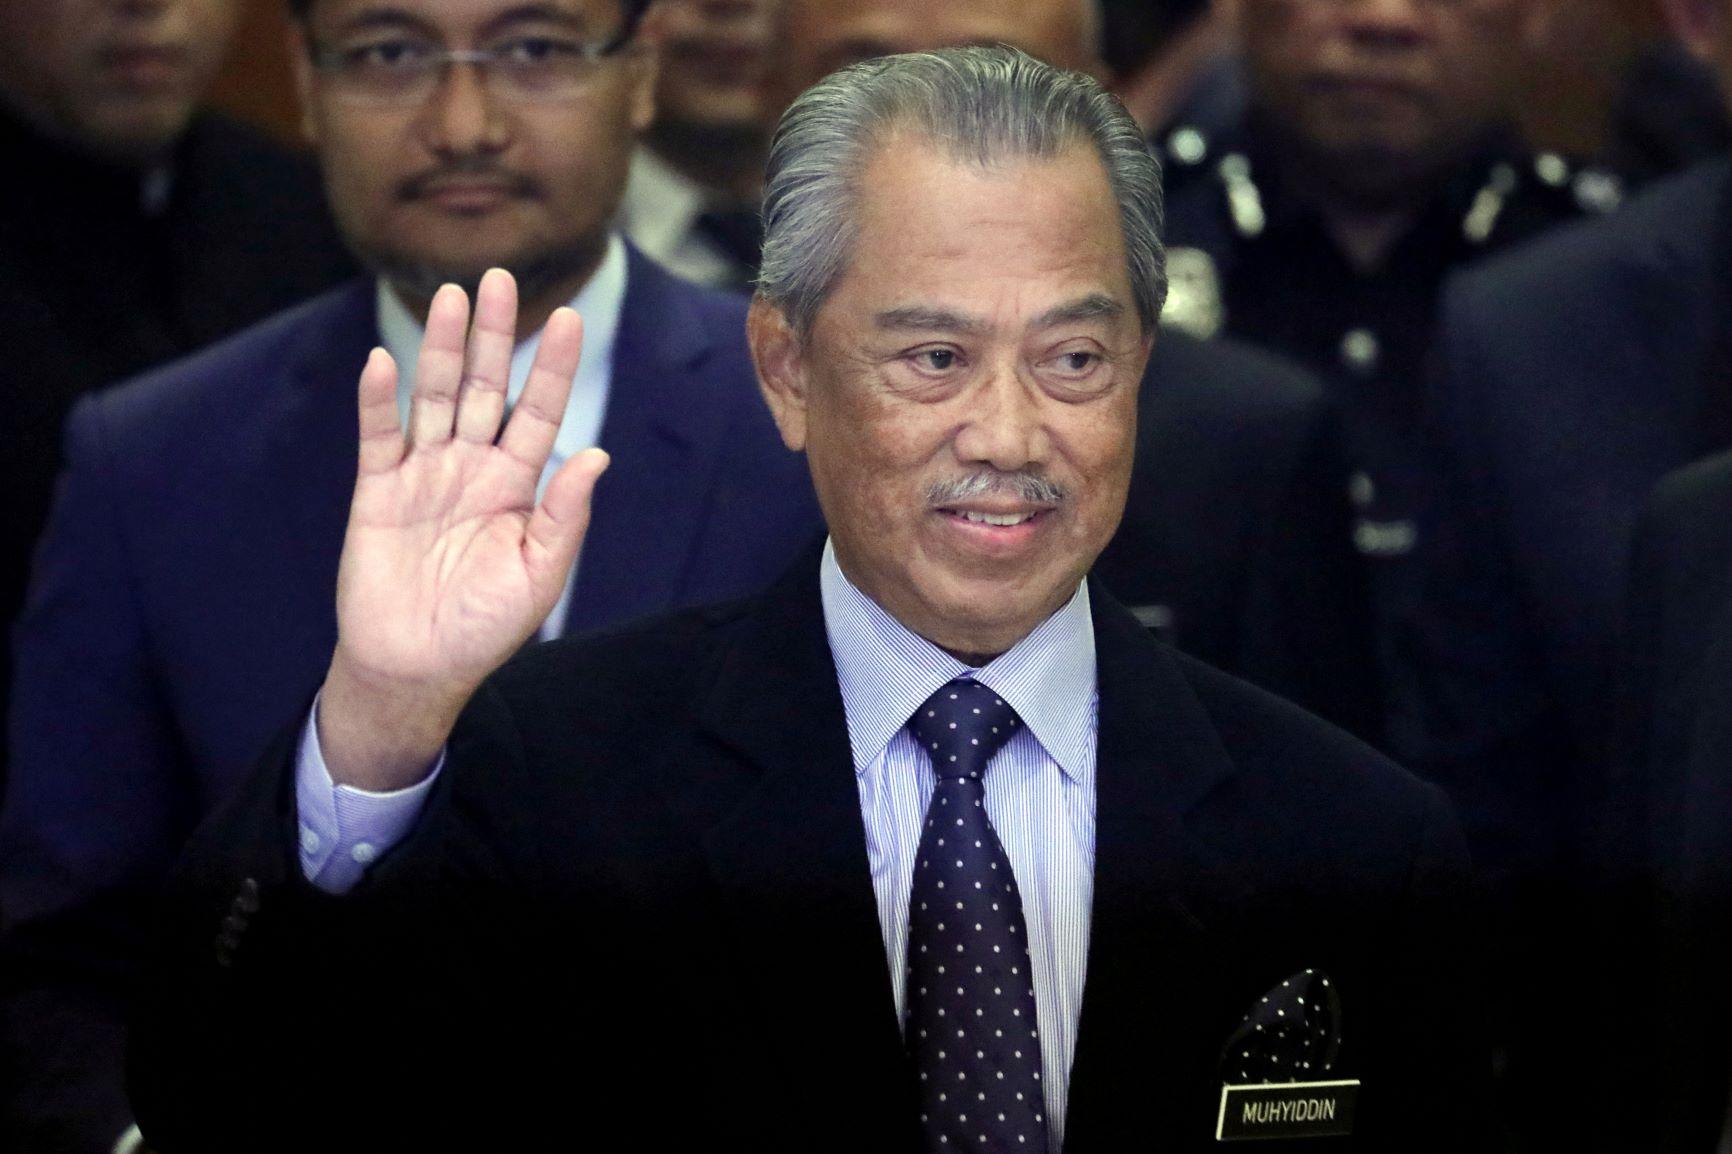 Muhyiddin - Malaysian Prime Minister Muhyiddin Yassin ...